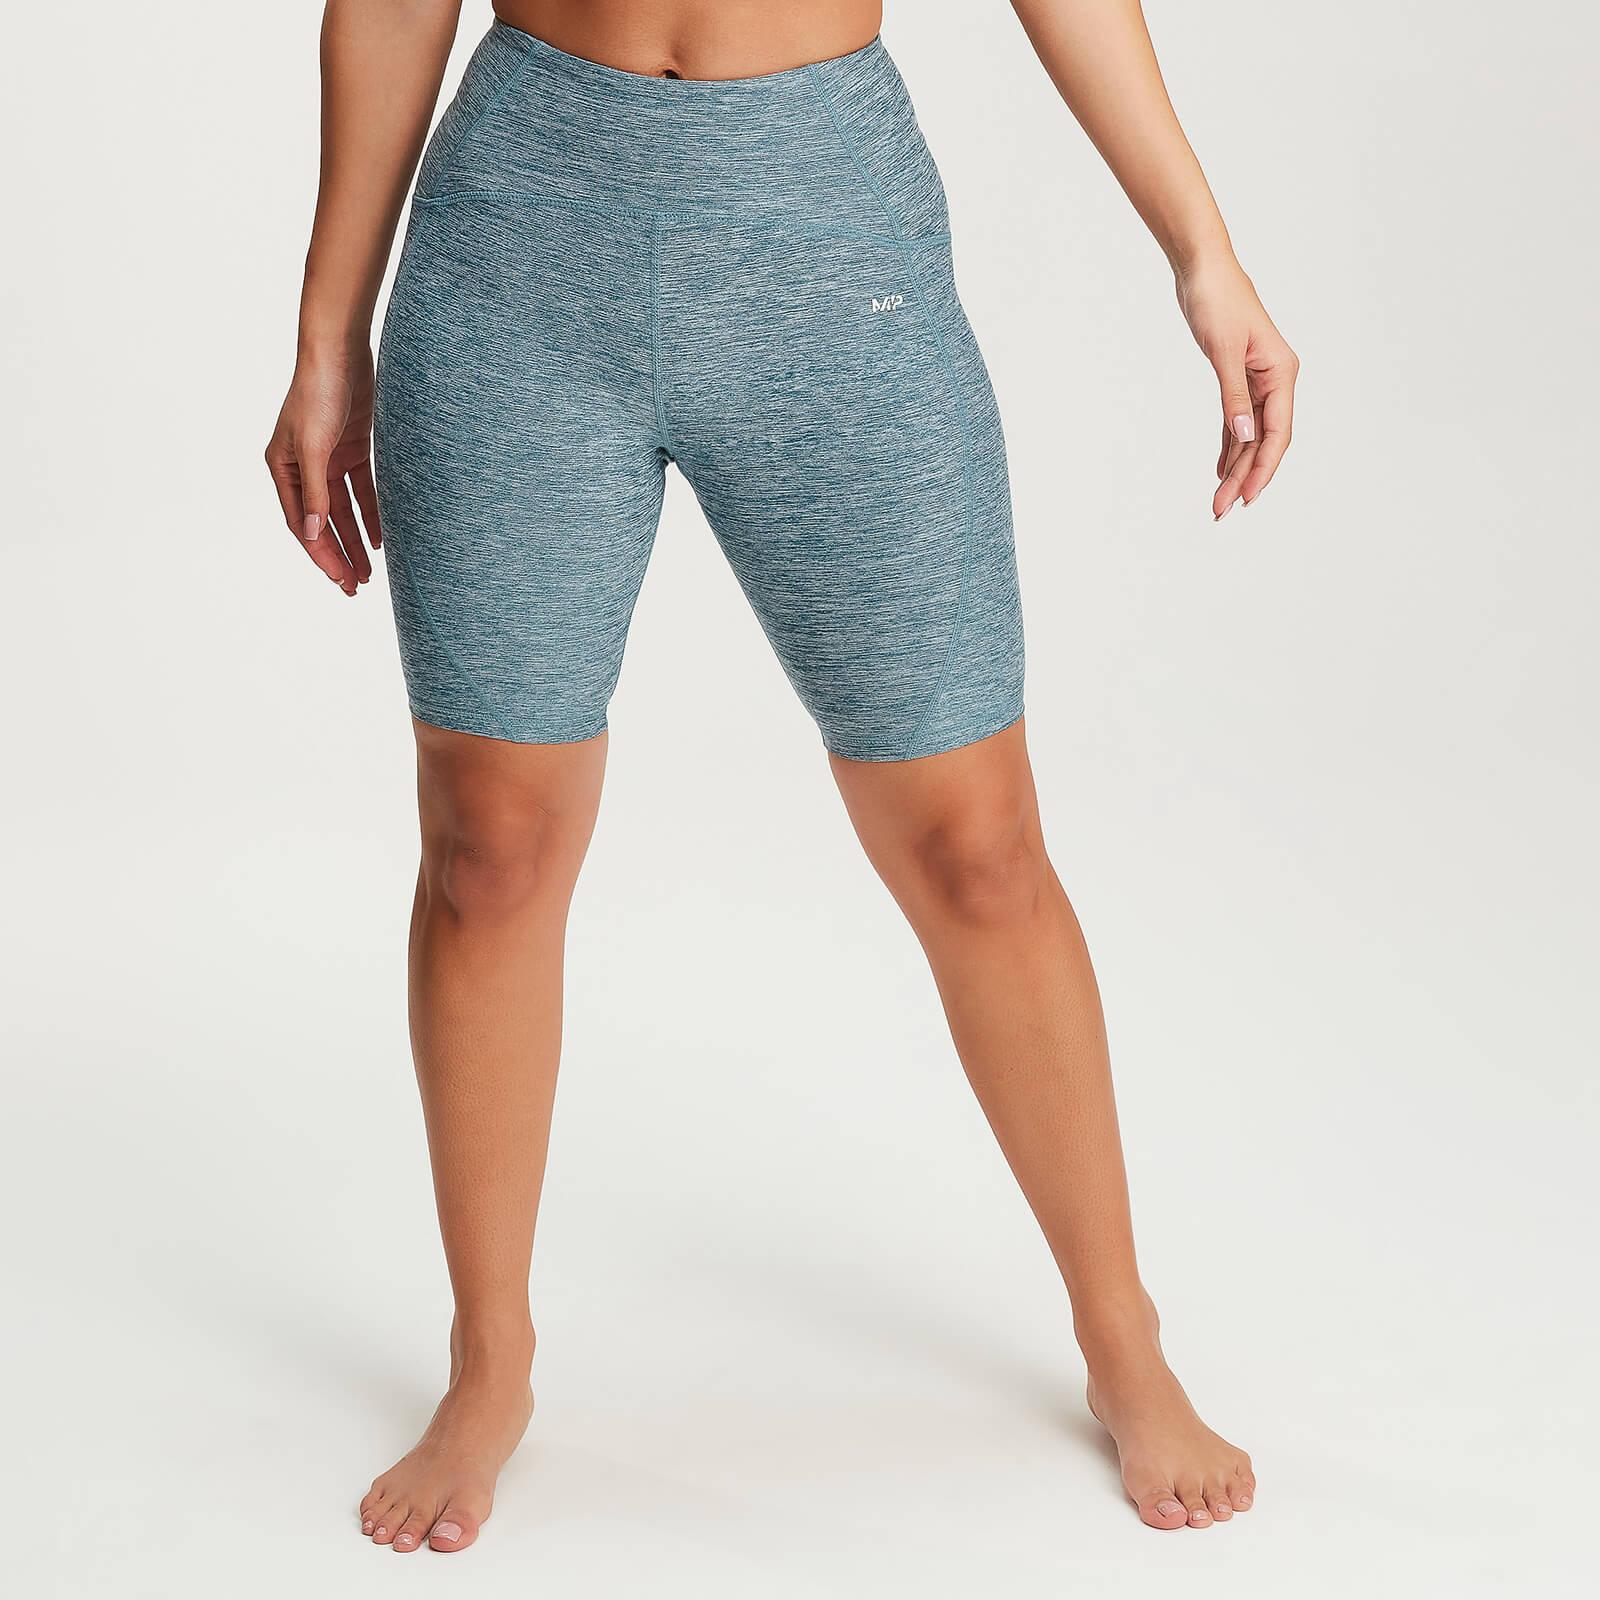 Damen Composure Radler-Shorts - Deep Lake - M